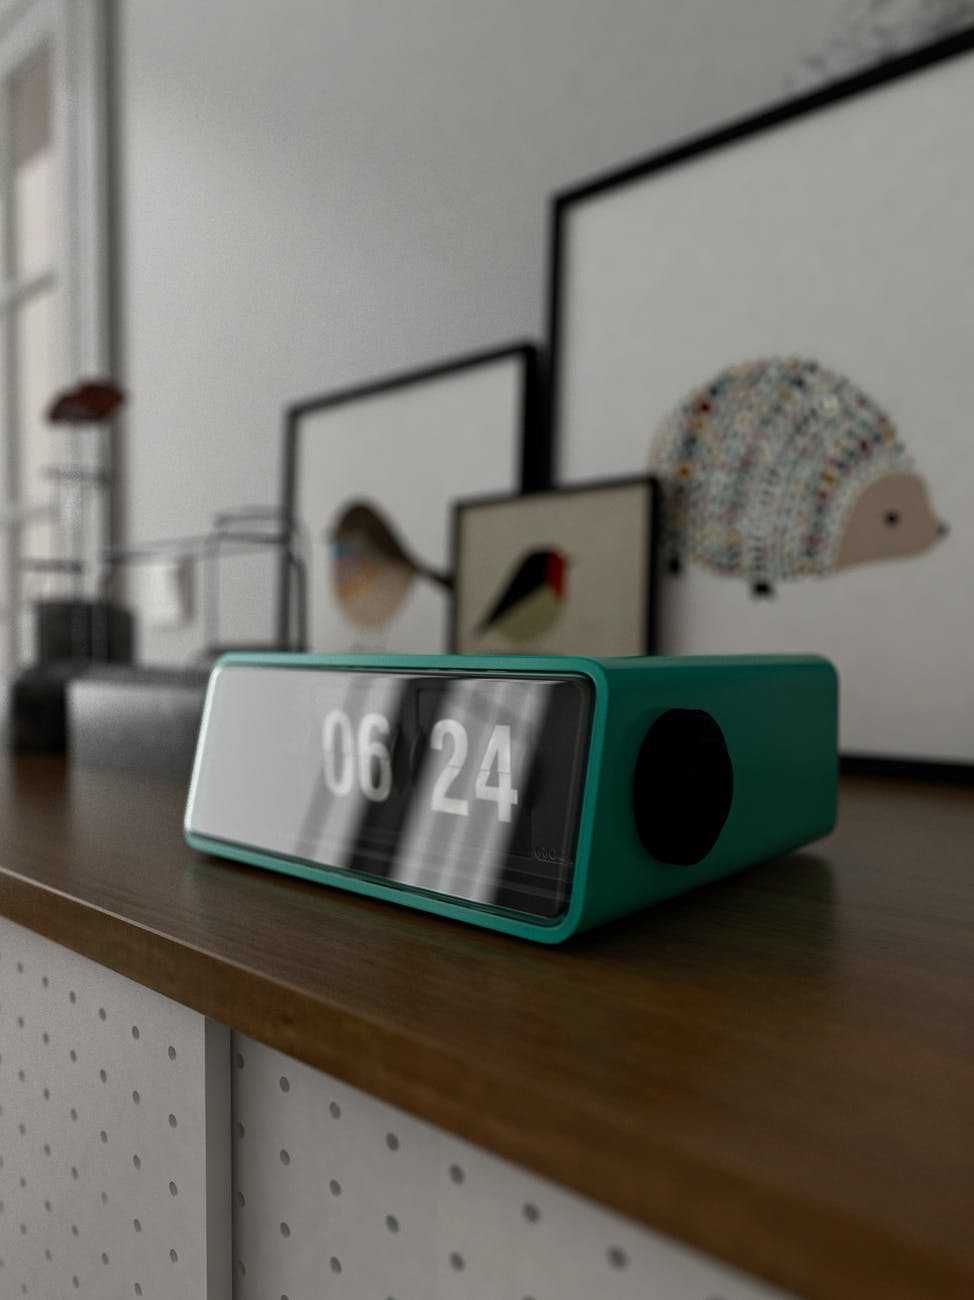 close up photo of teal digital clock